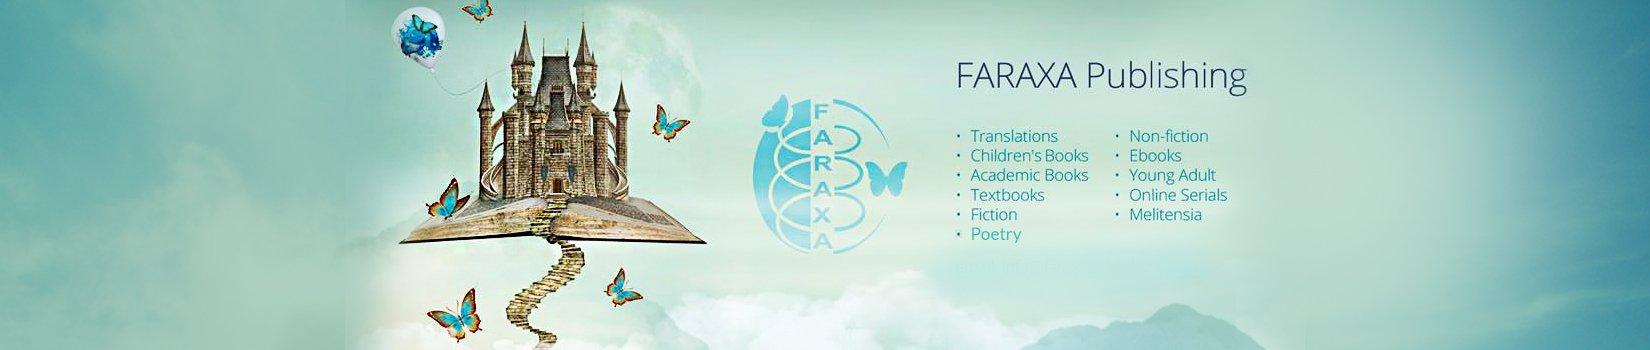 Faraxa Books